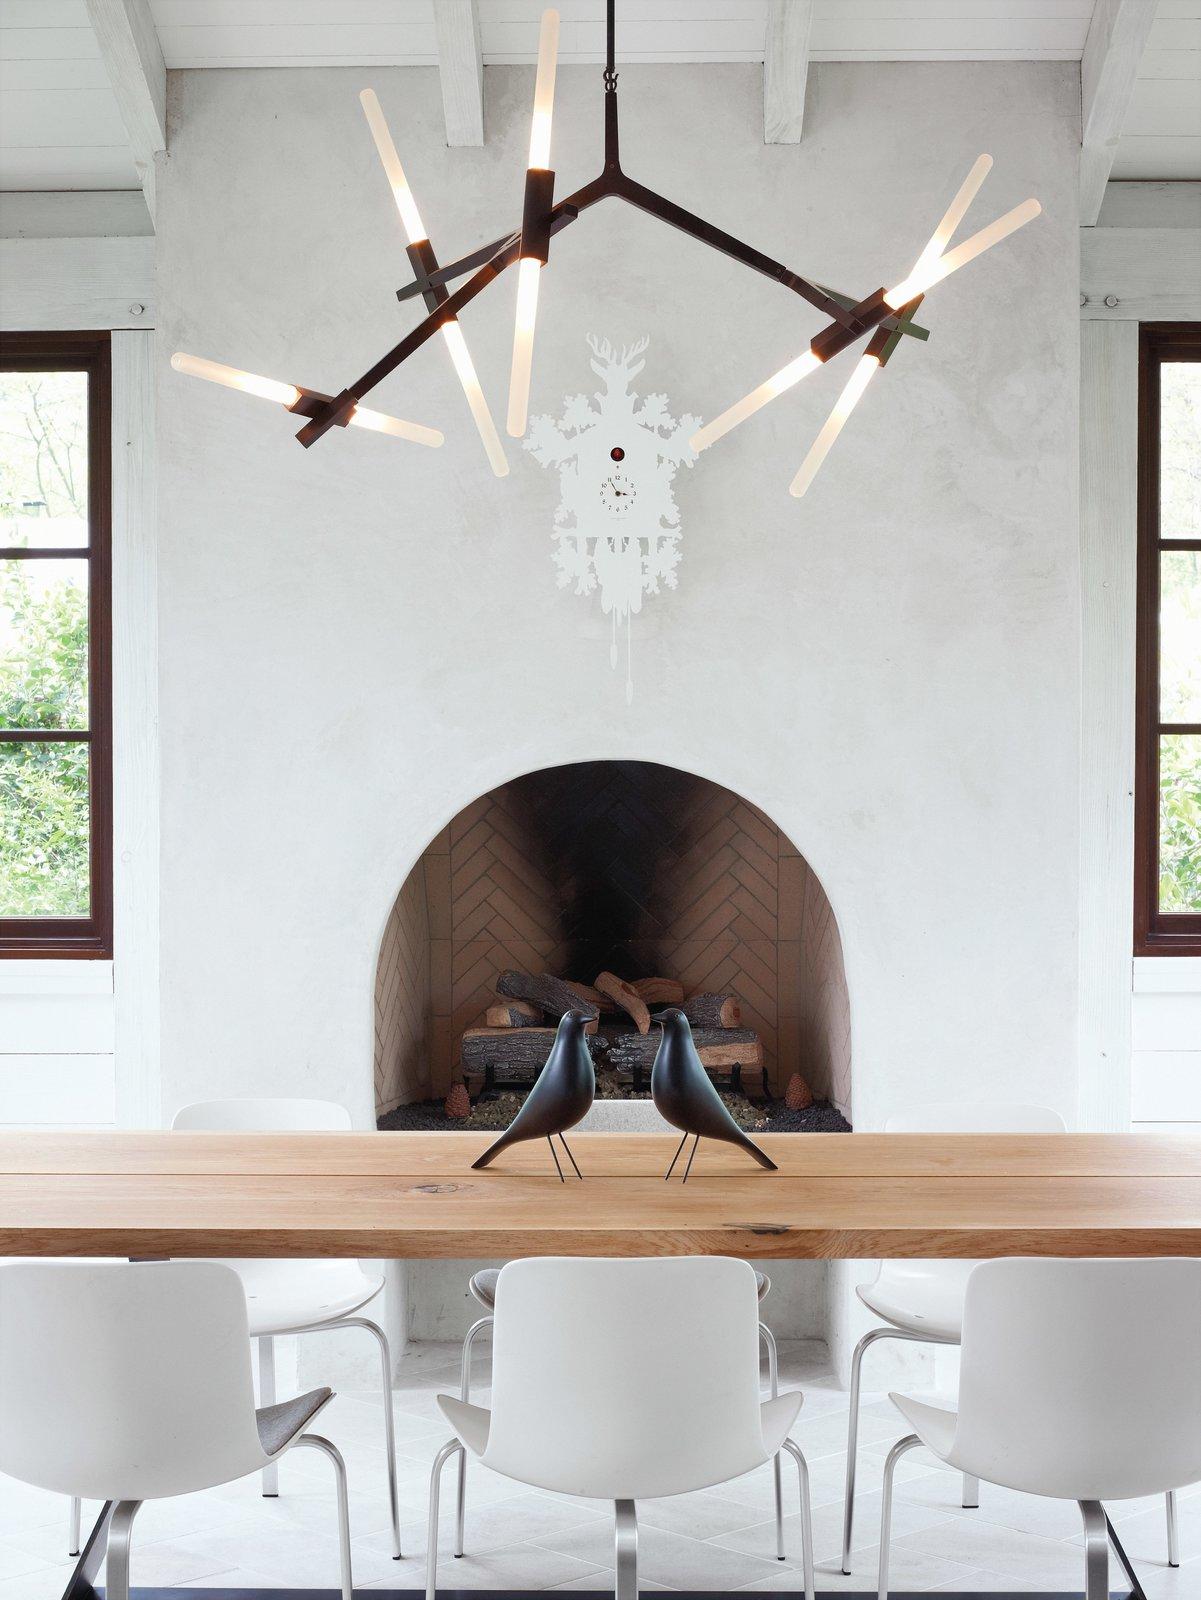 #interior #fireplace #modern #diningroom #chandelier #woodfireplace #rustic #bronze #lindseyadams #roll&hill #terrydwan #folkart #eames #eameshousebirdds #cuckooclock #Diamantini&Domeniconi #pk8 #republicoffritzhansen #PoulKjærlholm #kuhl-linscomb #houston #texas   97+ Modern Fireplace Ideas